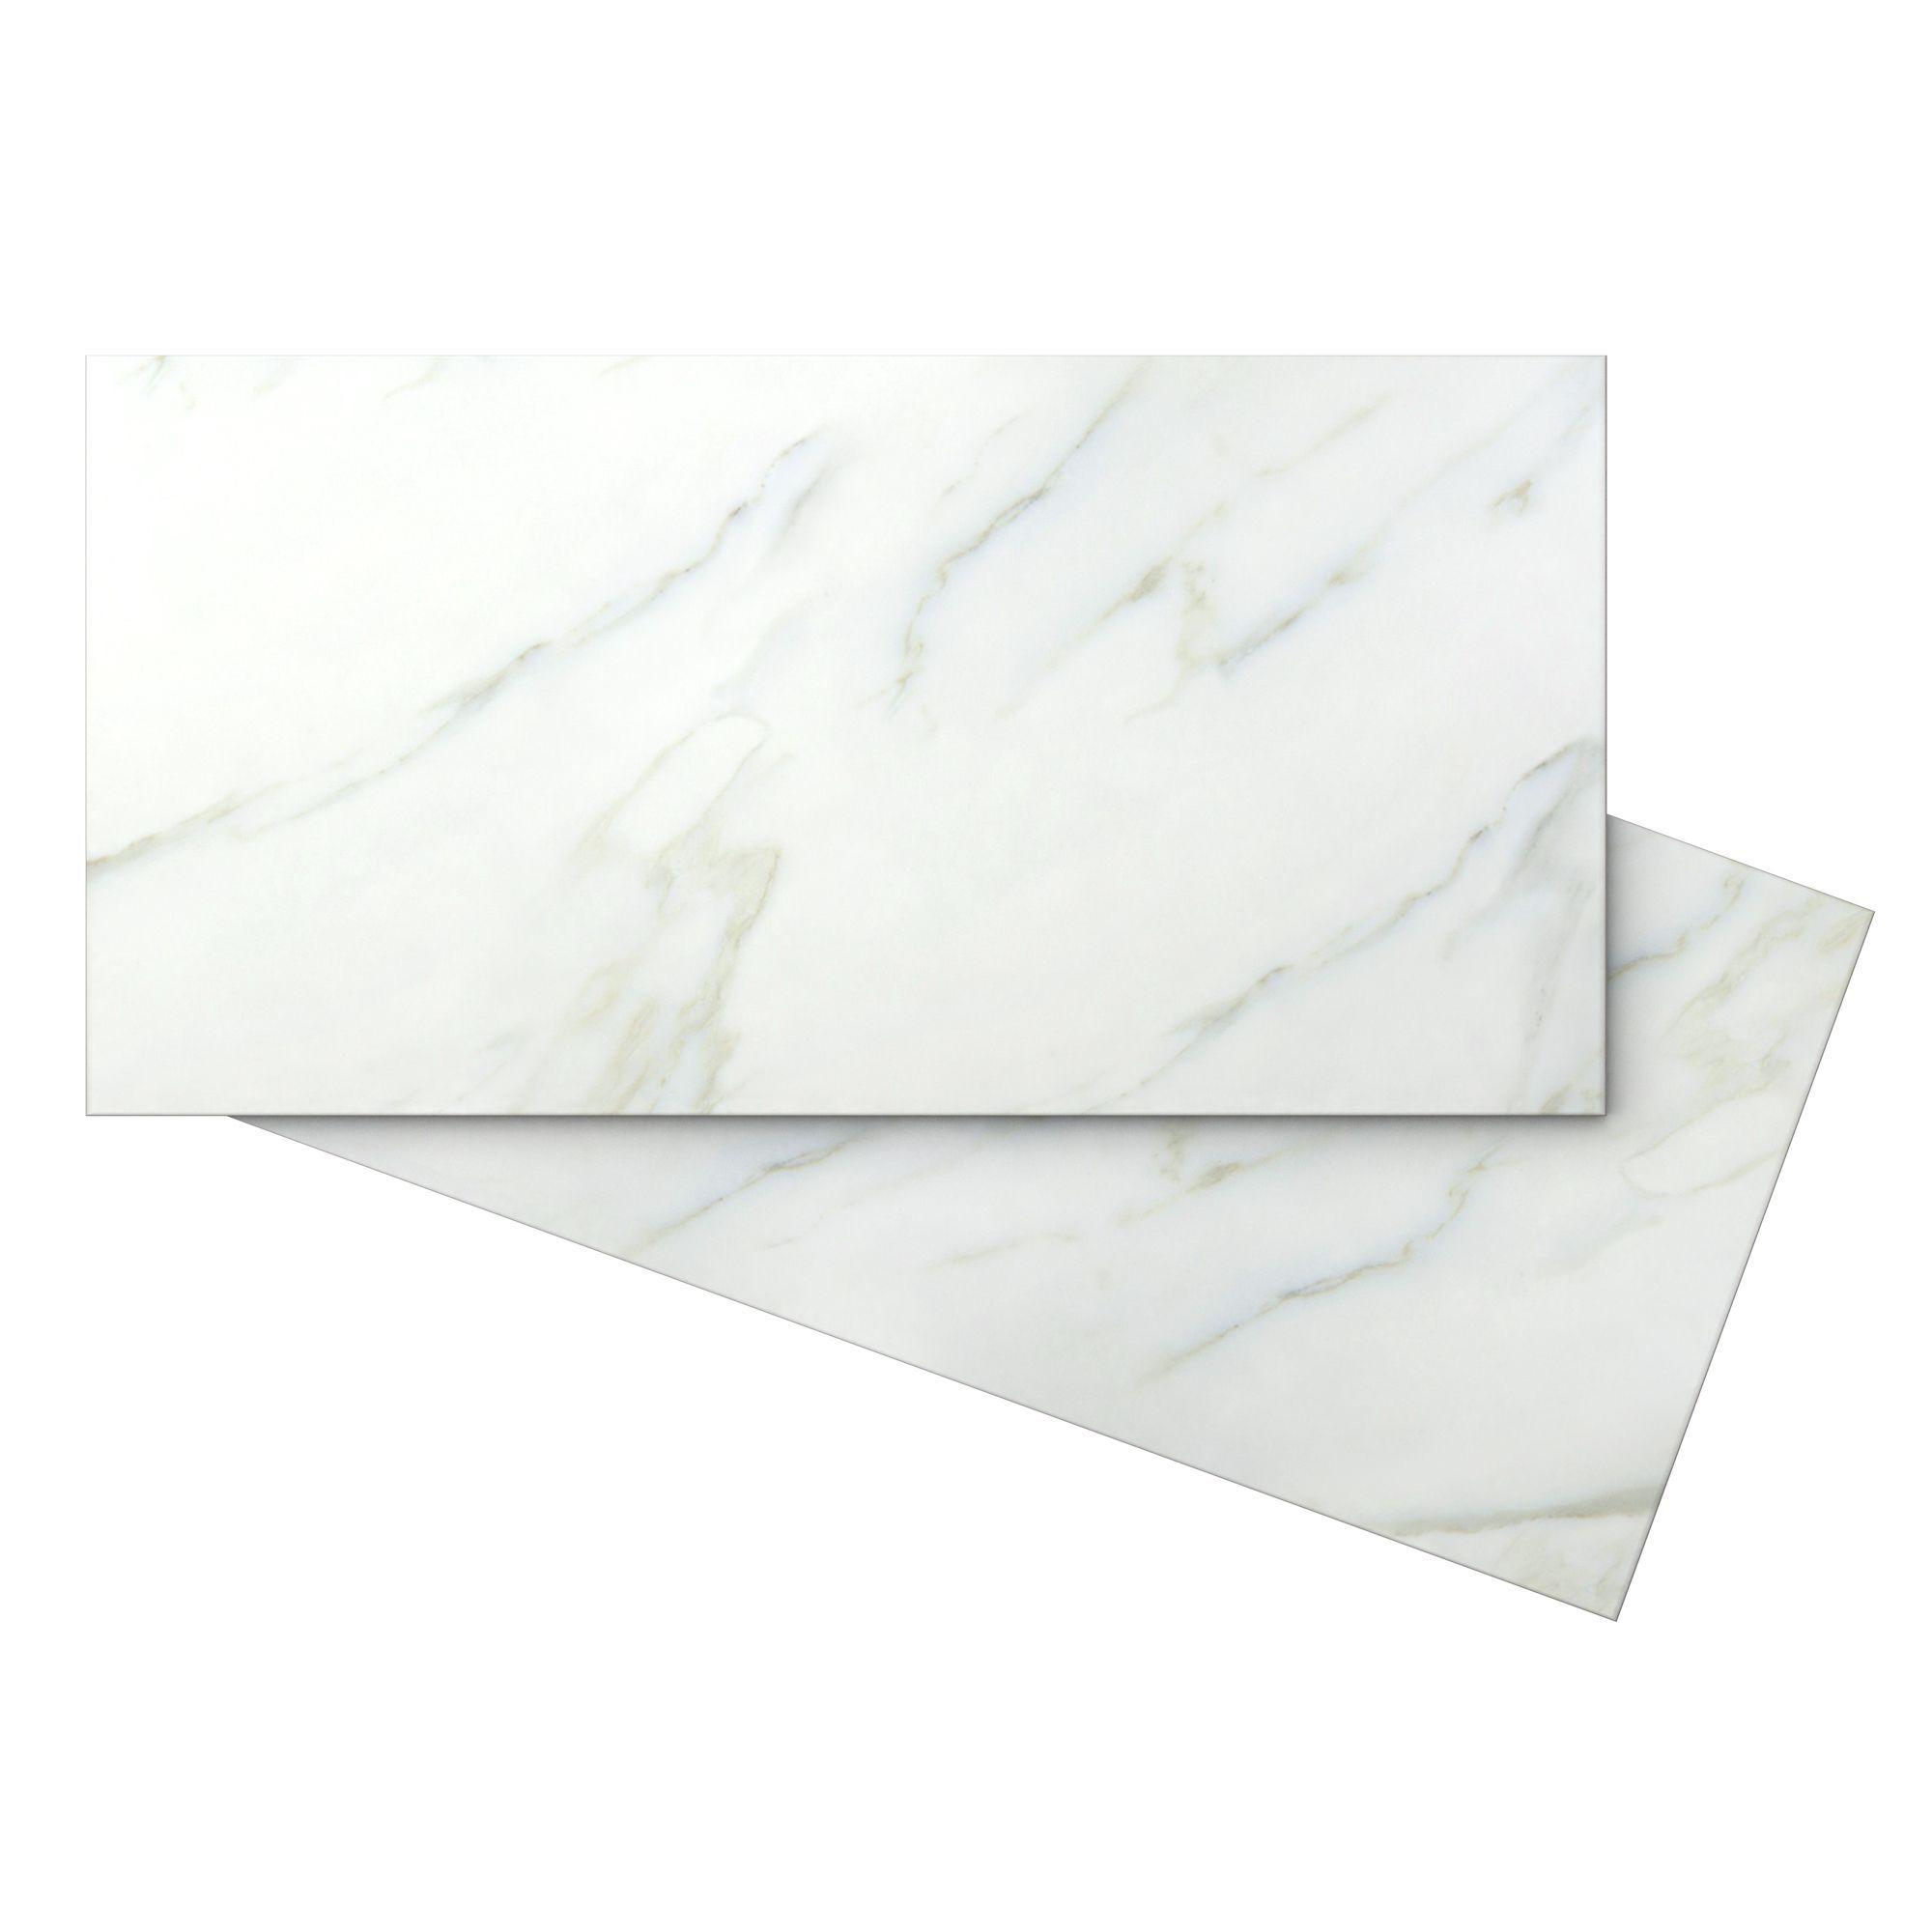 Aquila White Stone Effect Carrara Ceramic Wall Tile Pack